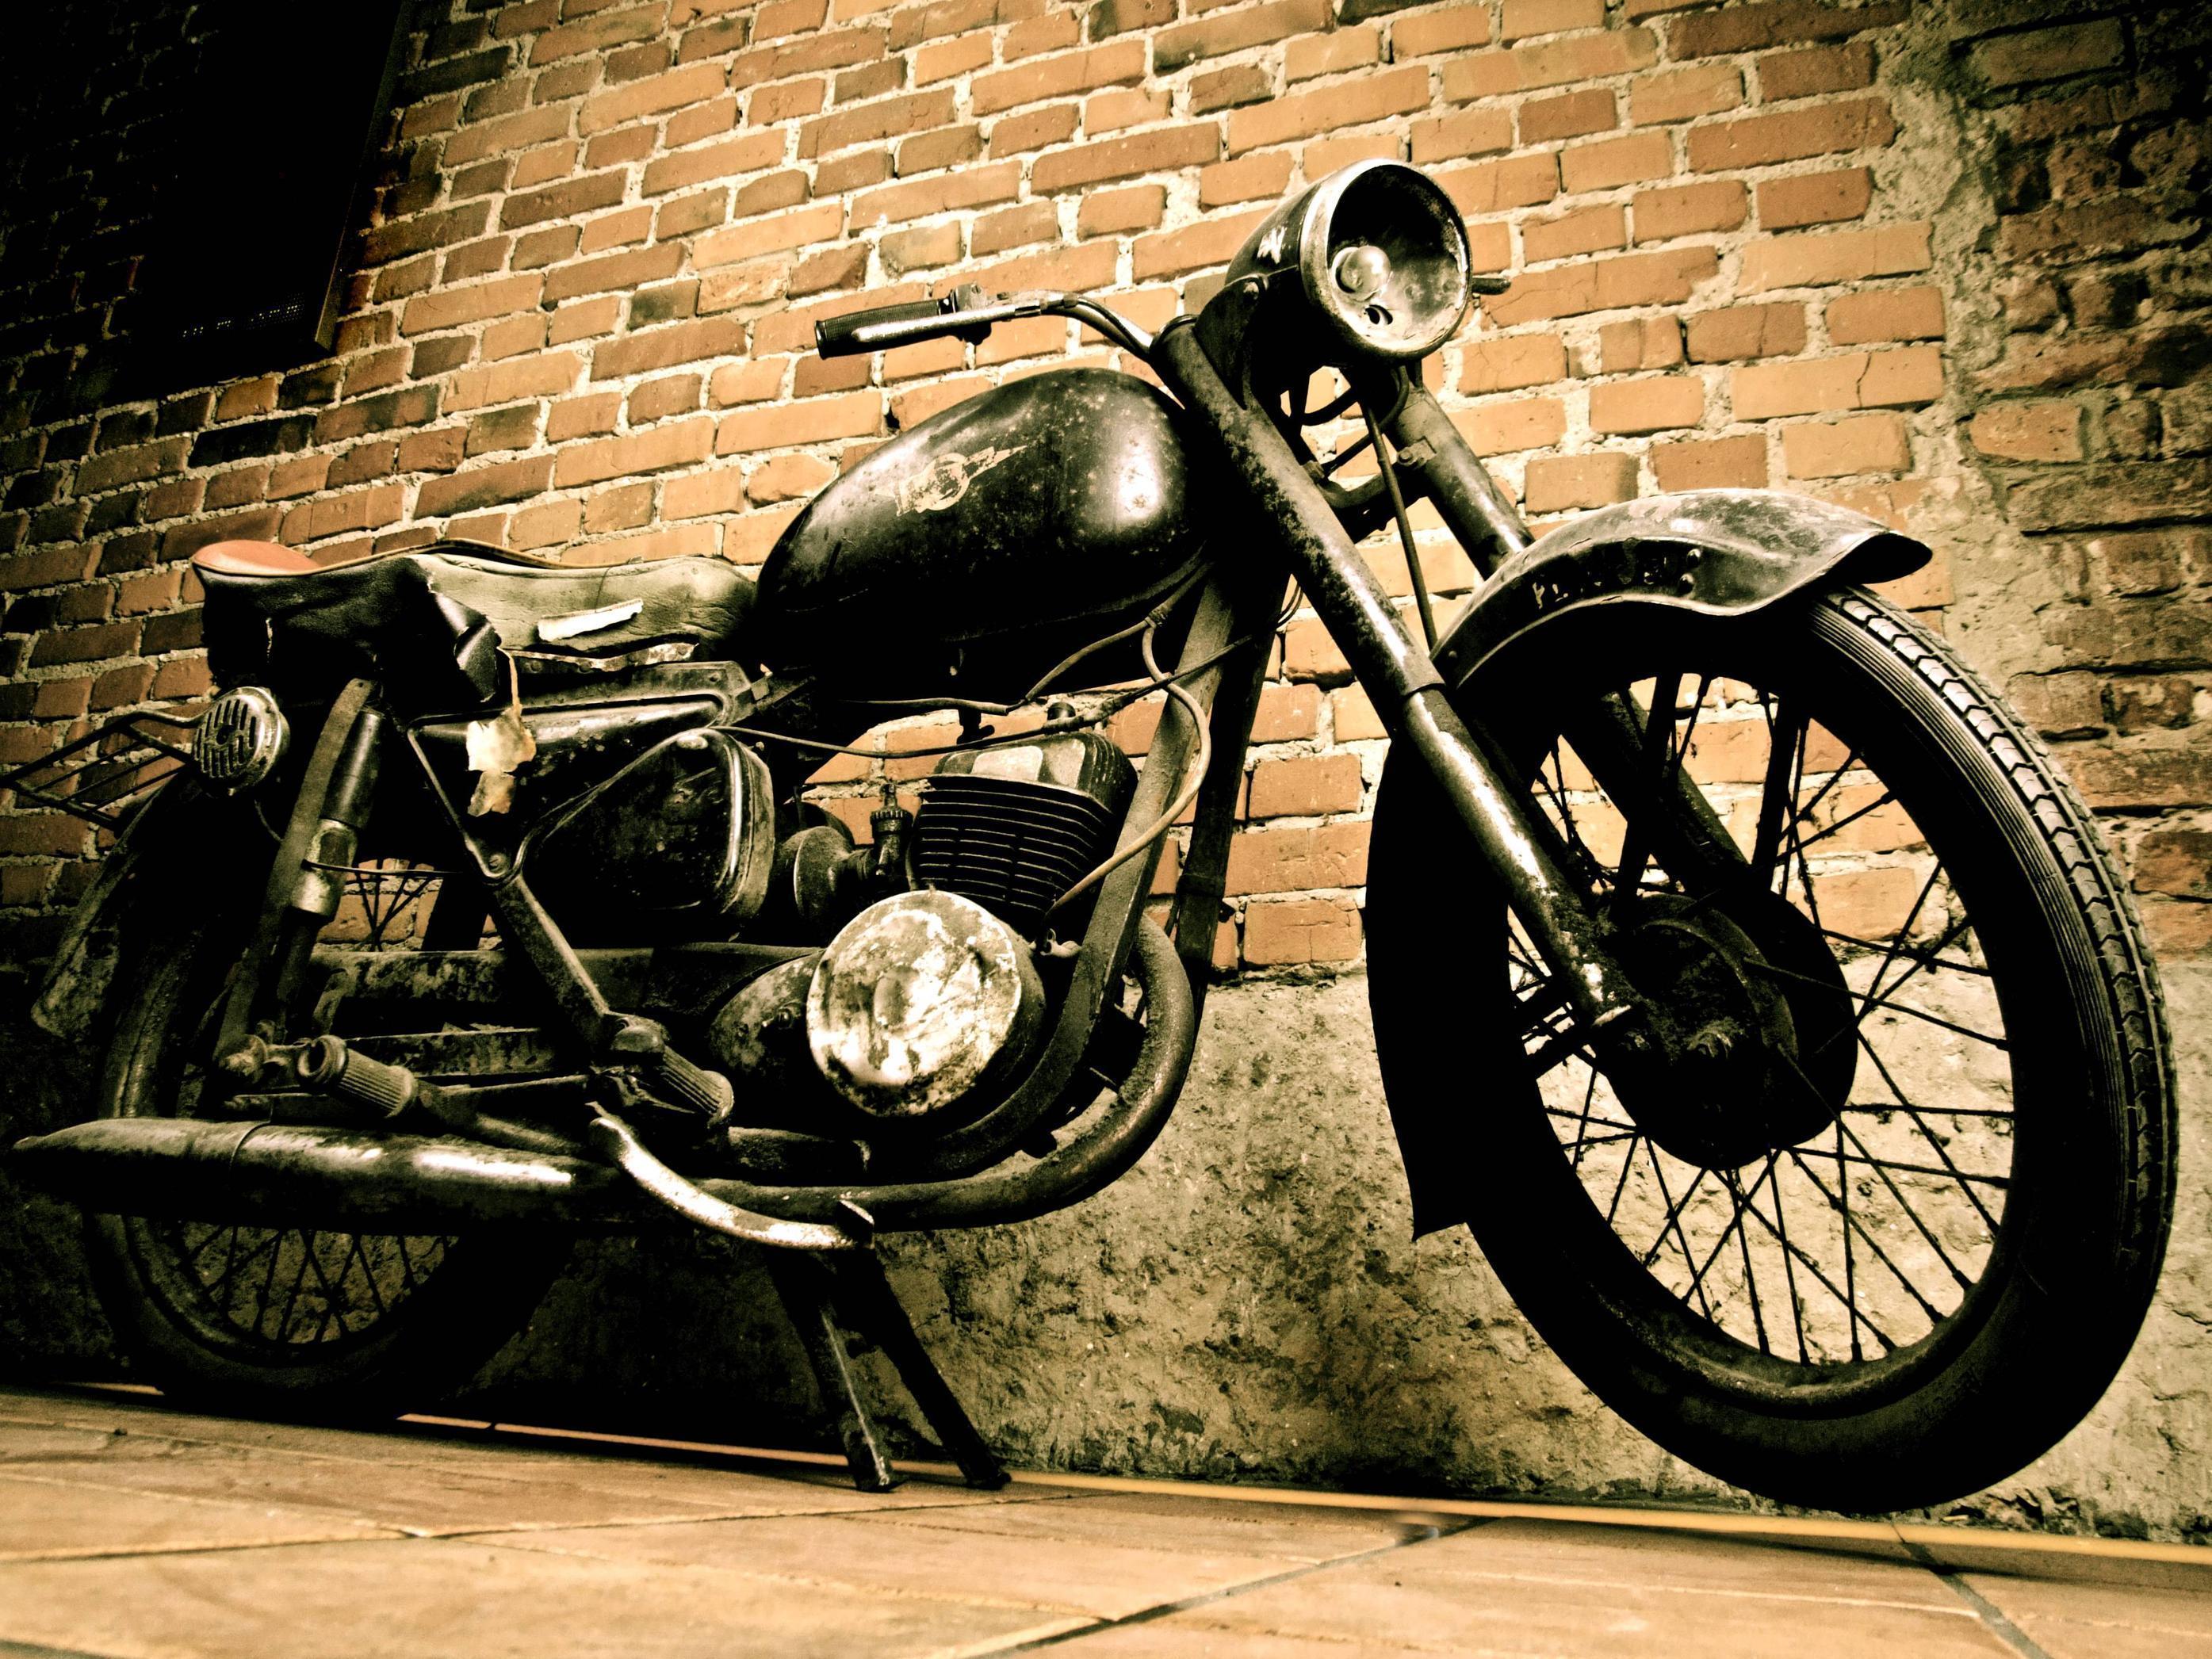 71] Vintage Motorcycle Wallpaper on WallpaperSafari 2790x2093